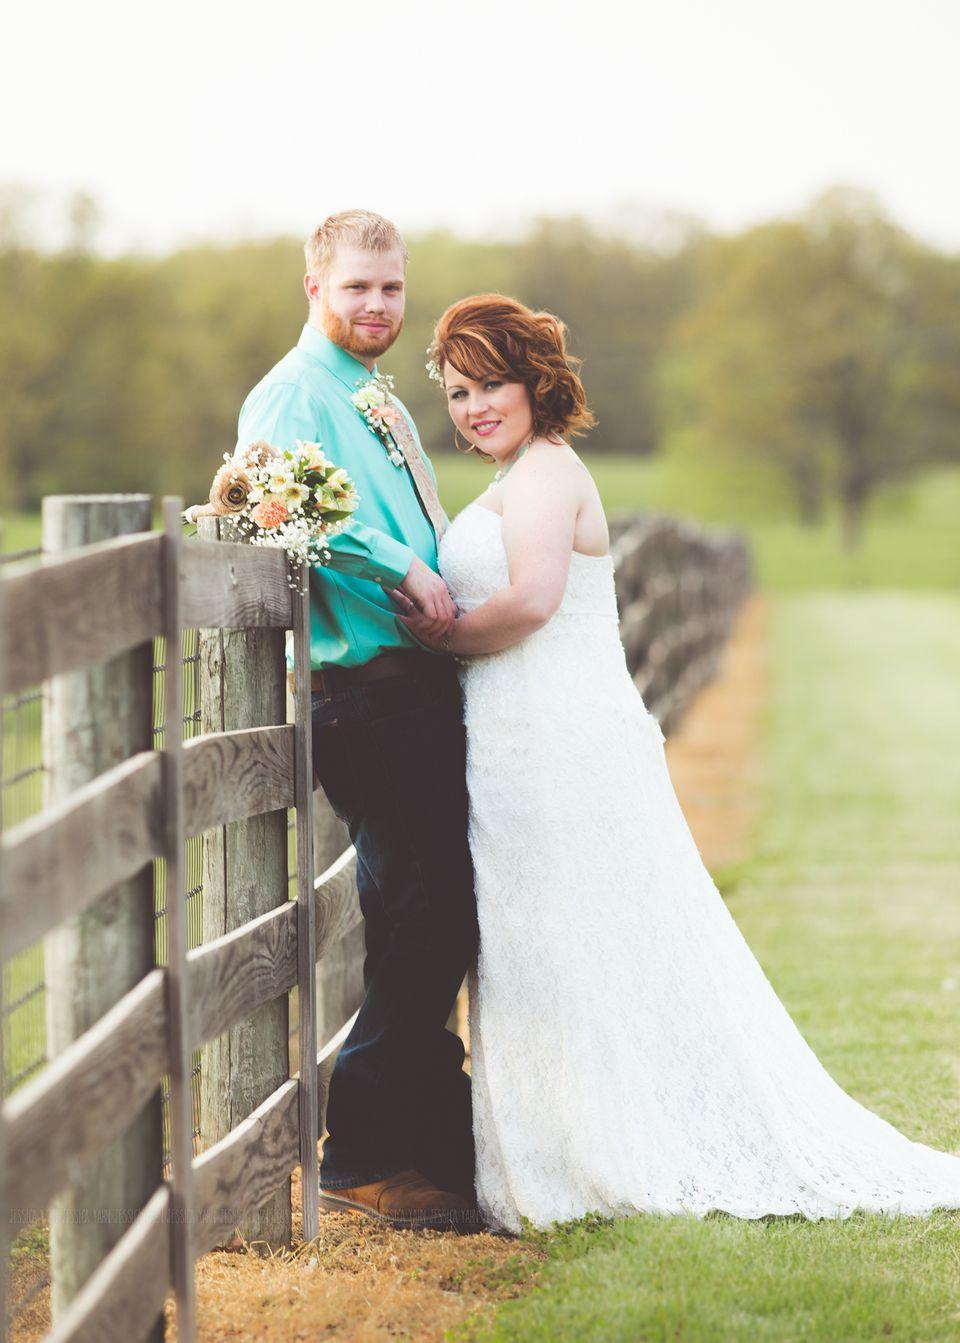 Brandon Shawna Jessica Yahn Springfield Missouri Wedding Photography Midwest Engagement